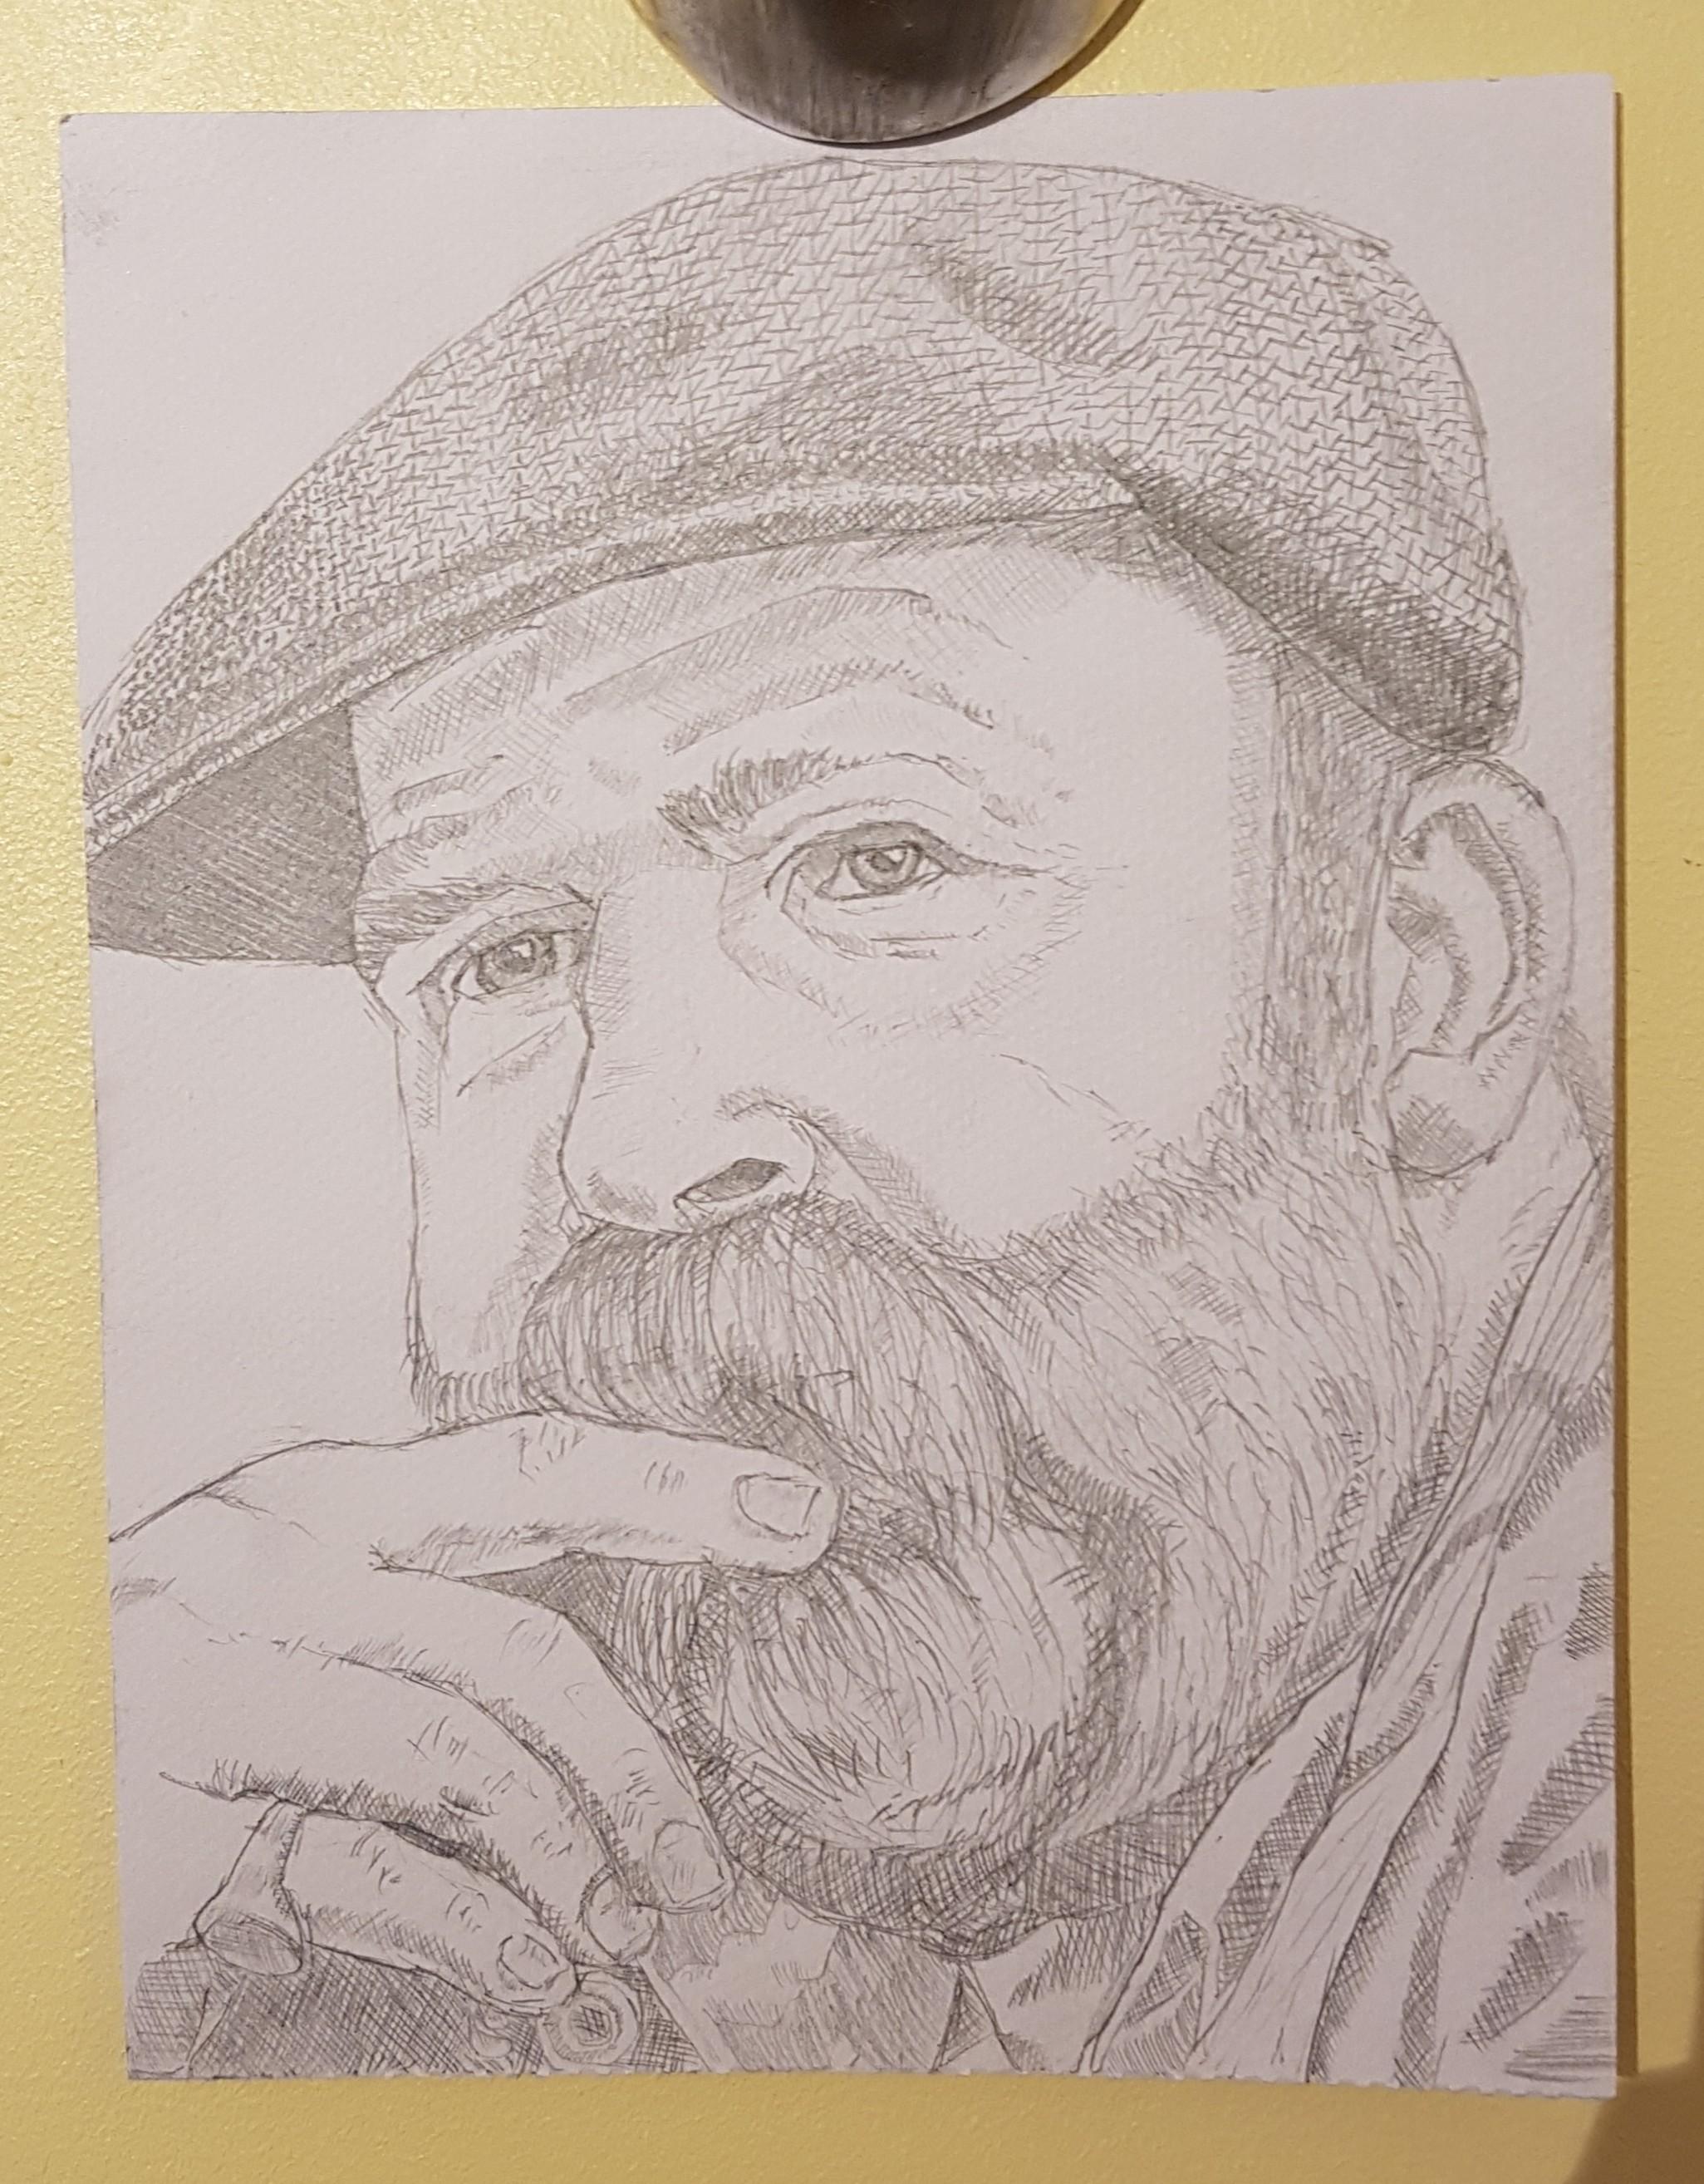 Dick Strawbridge pencil drawing by Glenn Quigley